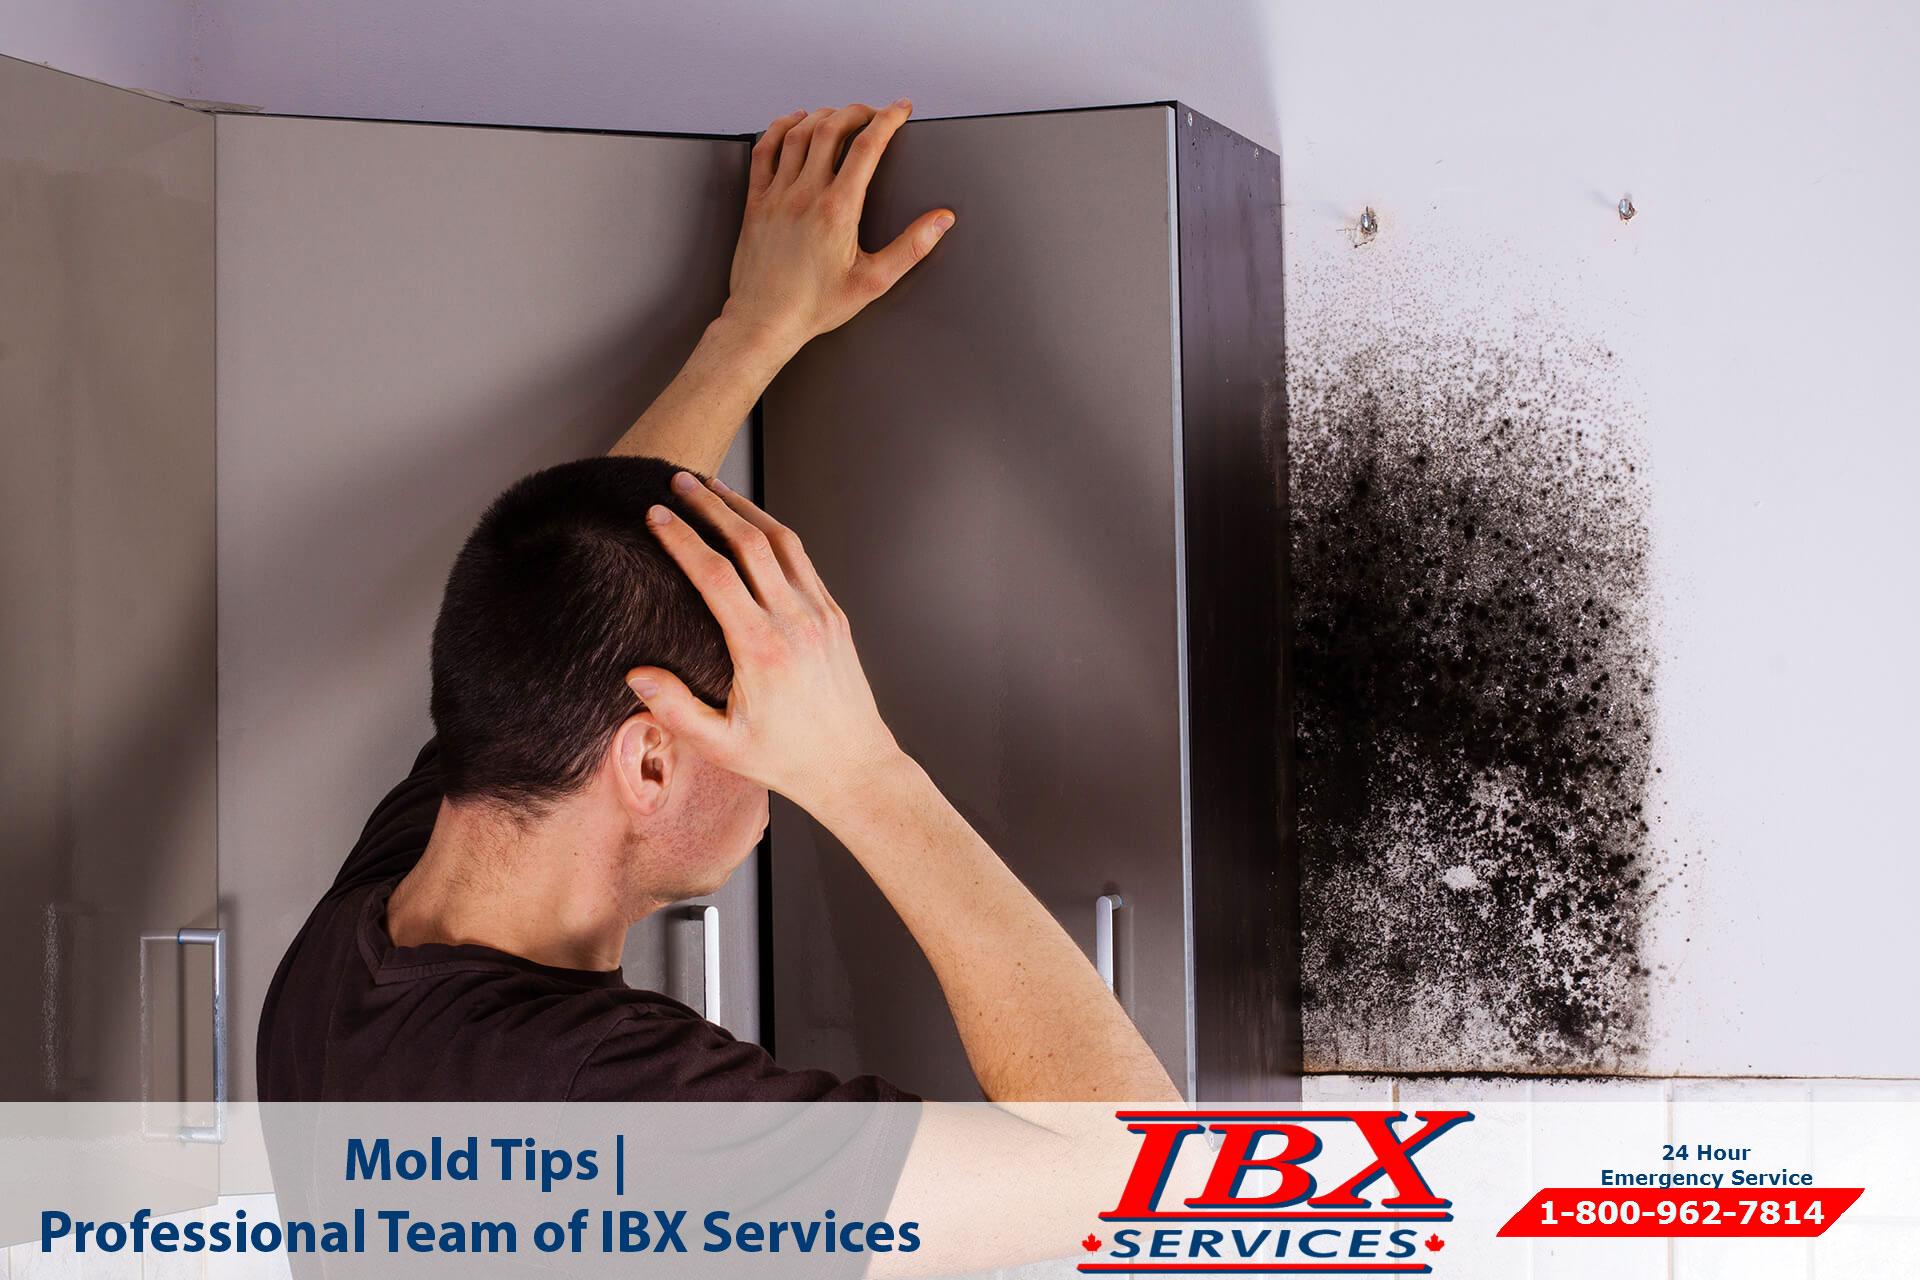 Mold Tips